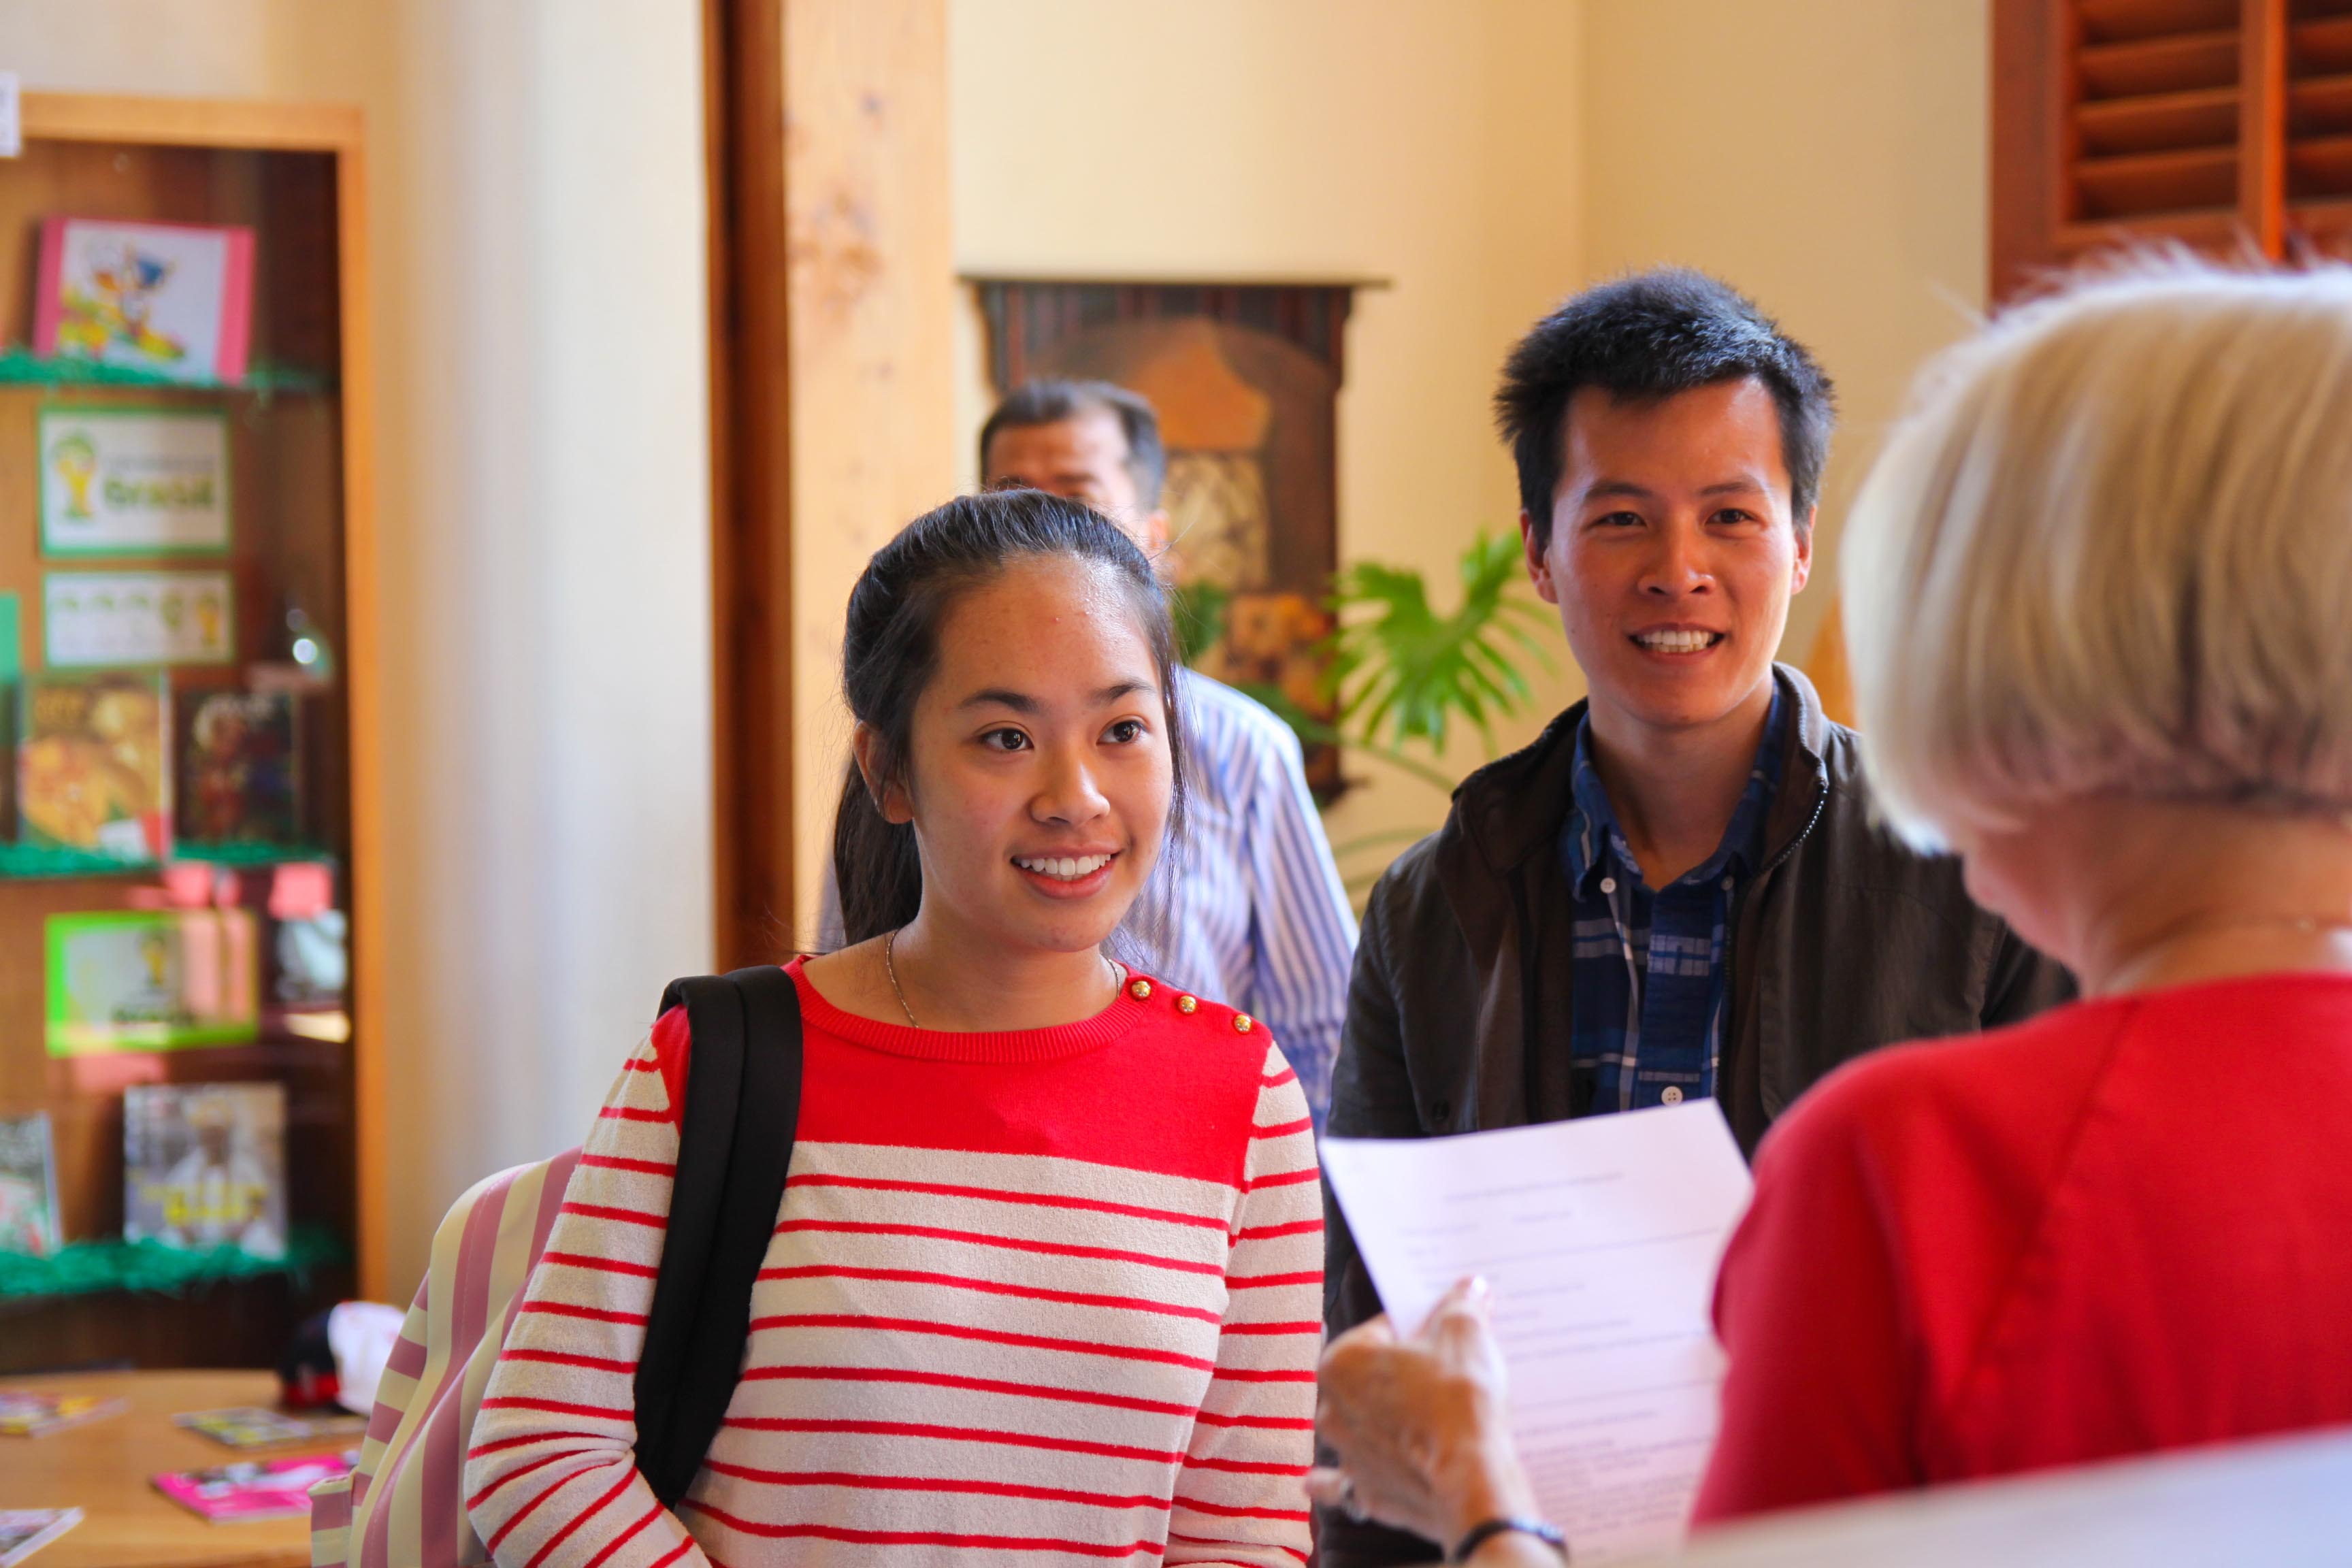 Proctor Academy Registration Day 4